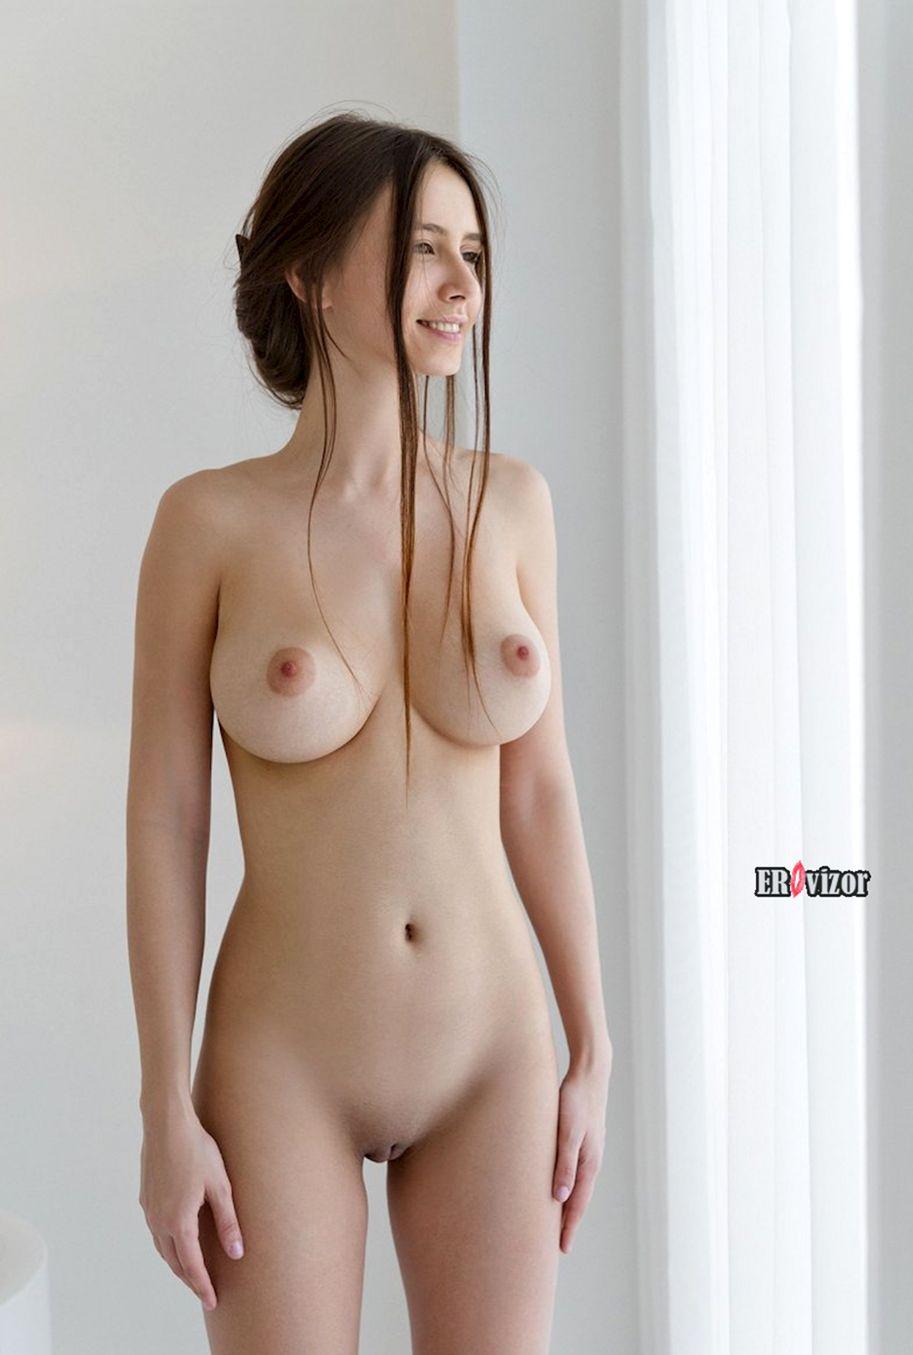 Busty-Brunette-Jessica(4)